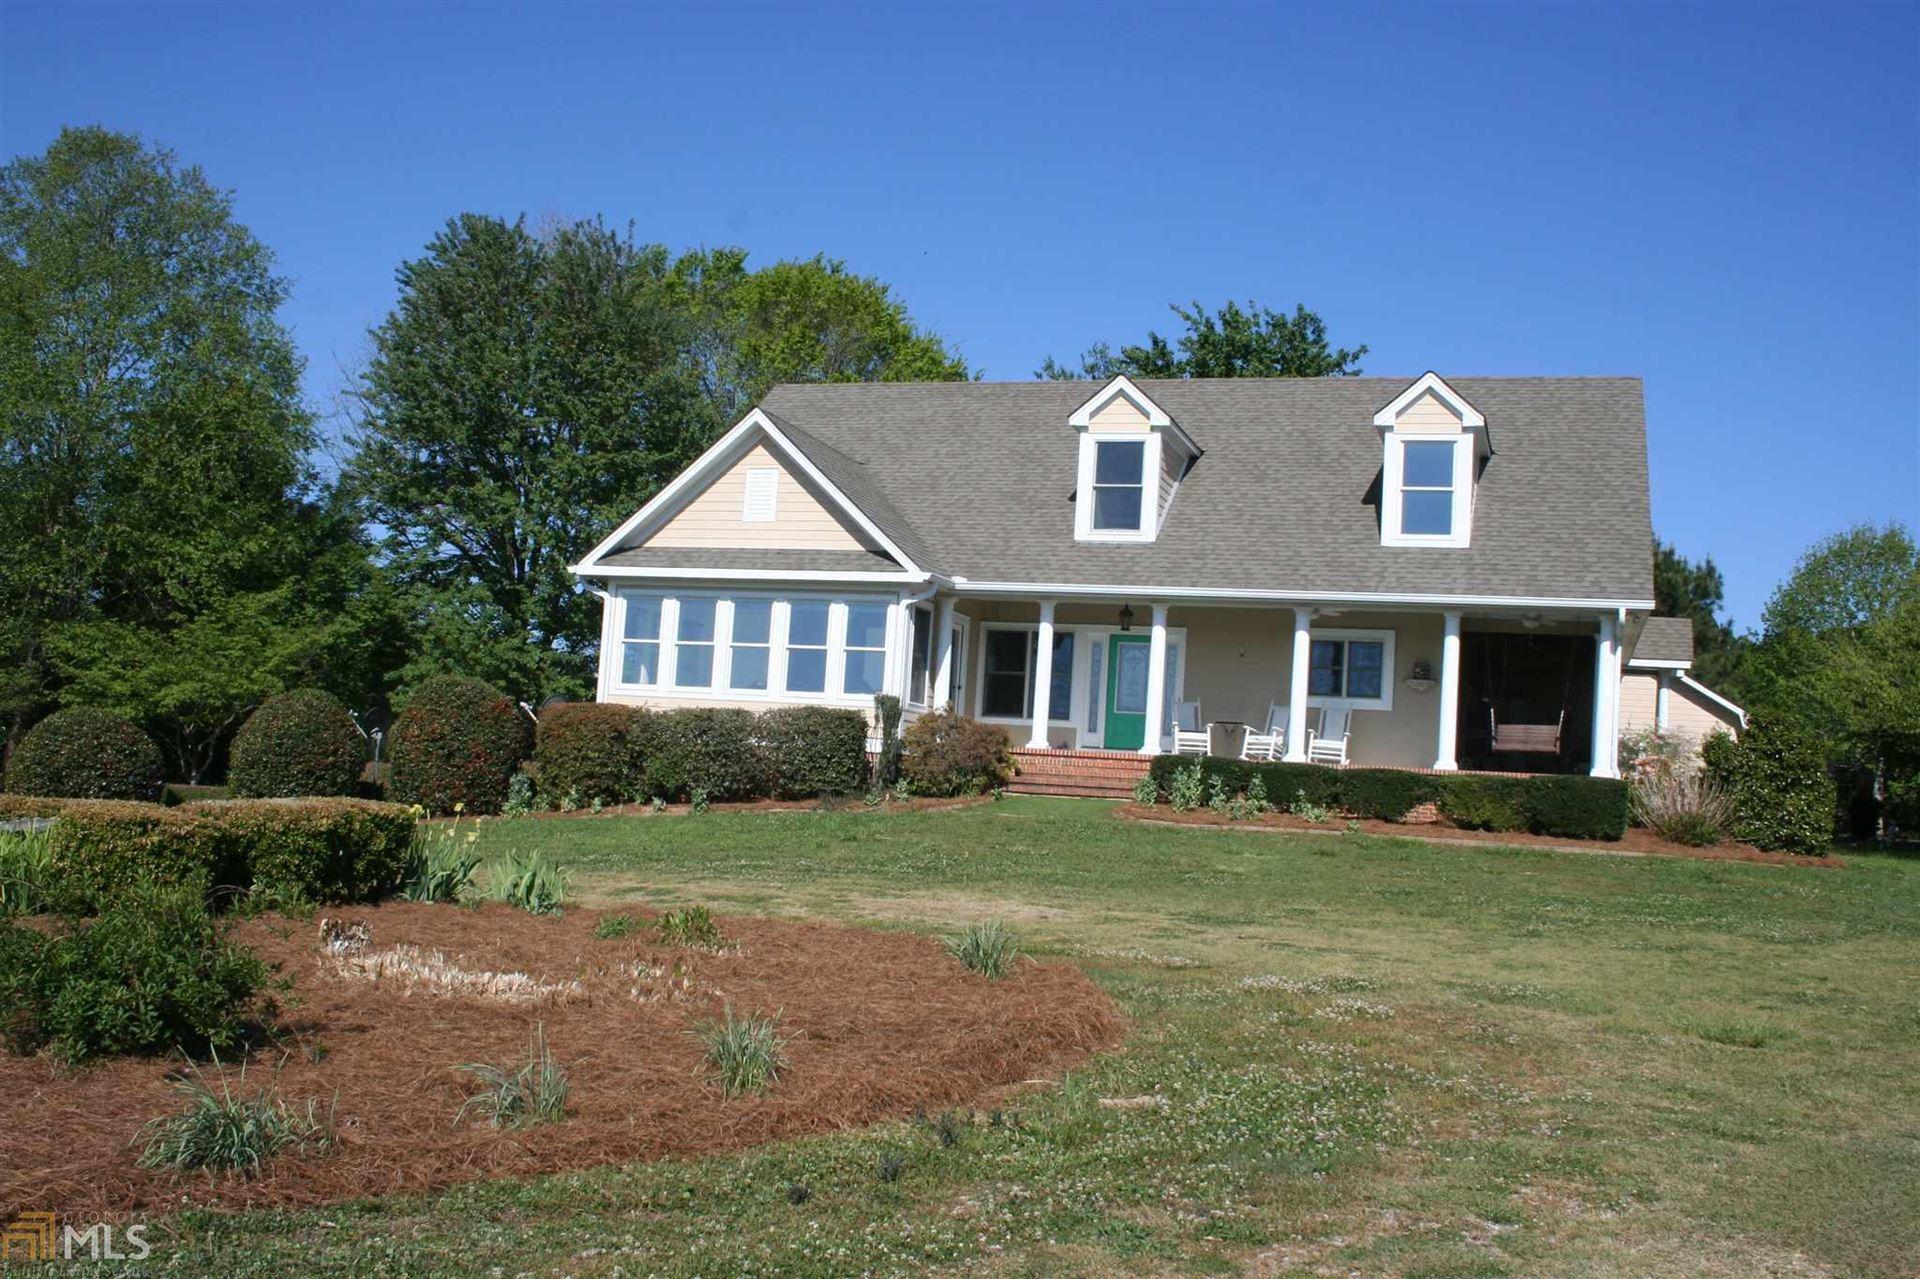 3250 Lick Skillet Rd, Greensboro, GA 30642 - MLS#: 8863924